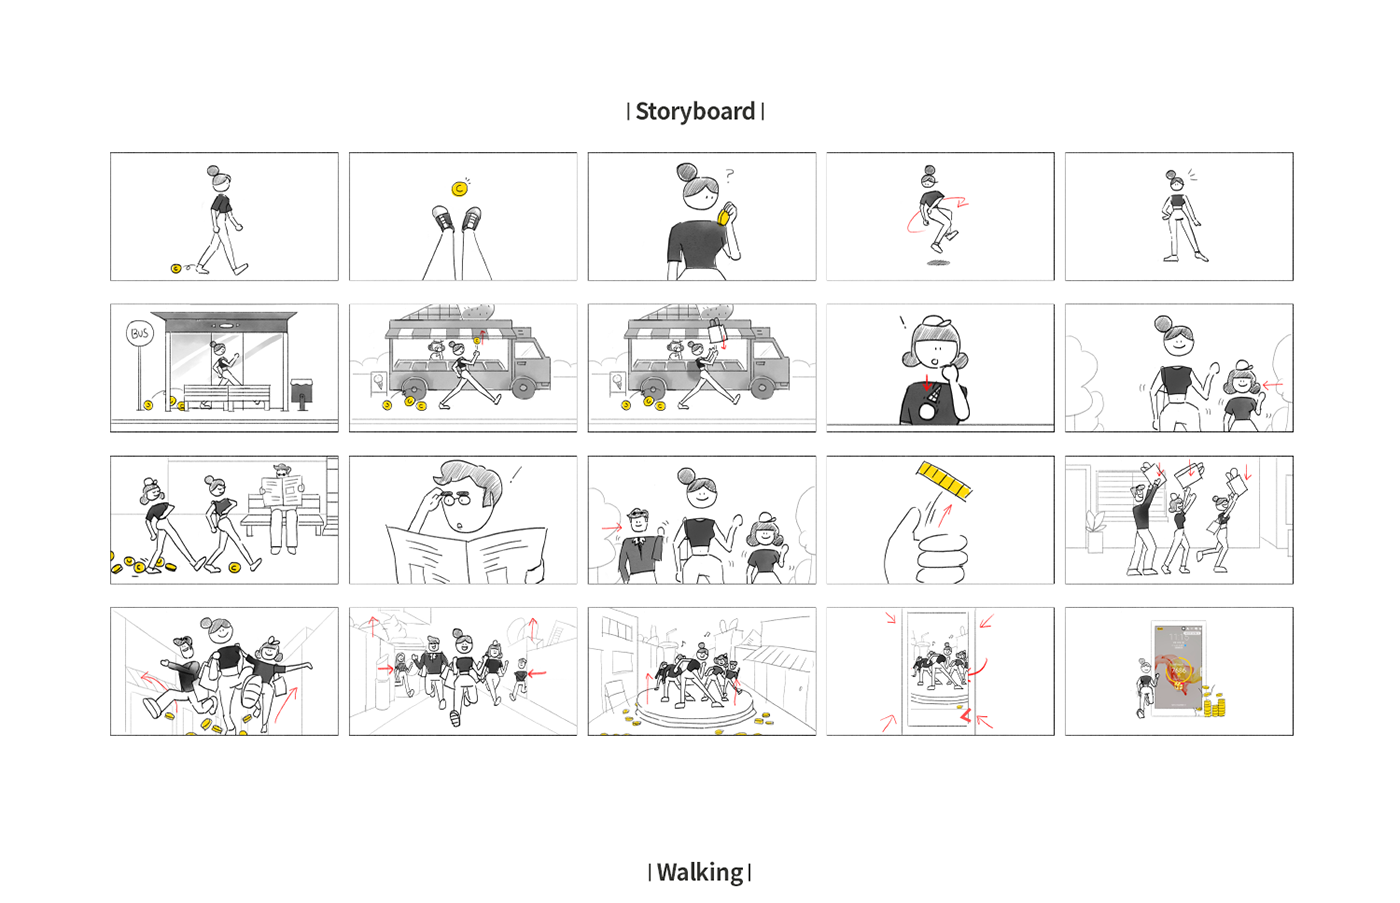 3D 3dcharacter Brandfilm cashwalk Character 브랜딩 캐릭터 c4d graphicdesign 캐시워크